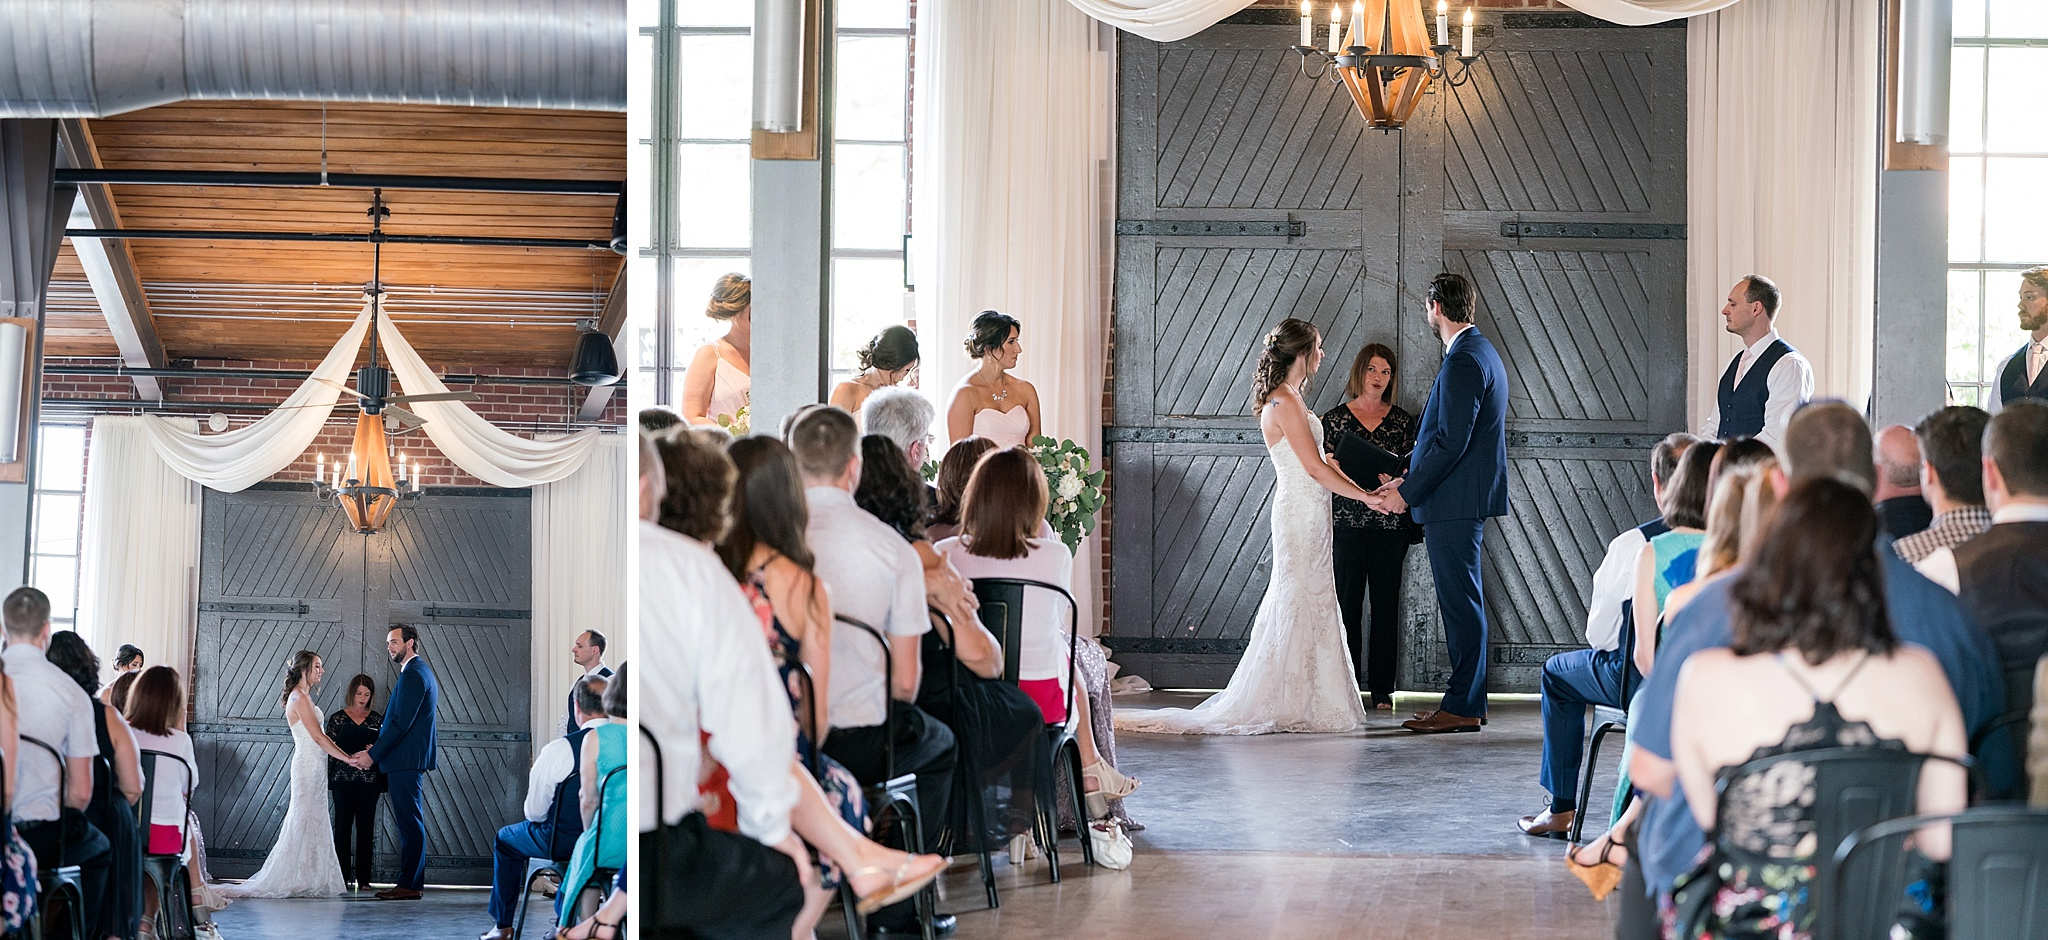 Rickhouse-Durham-NC-Wedding-Photographer-045.jpg